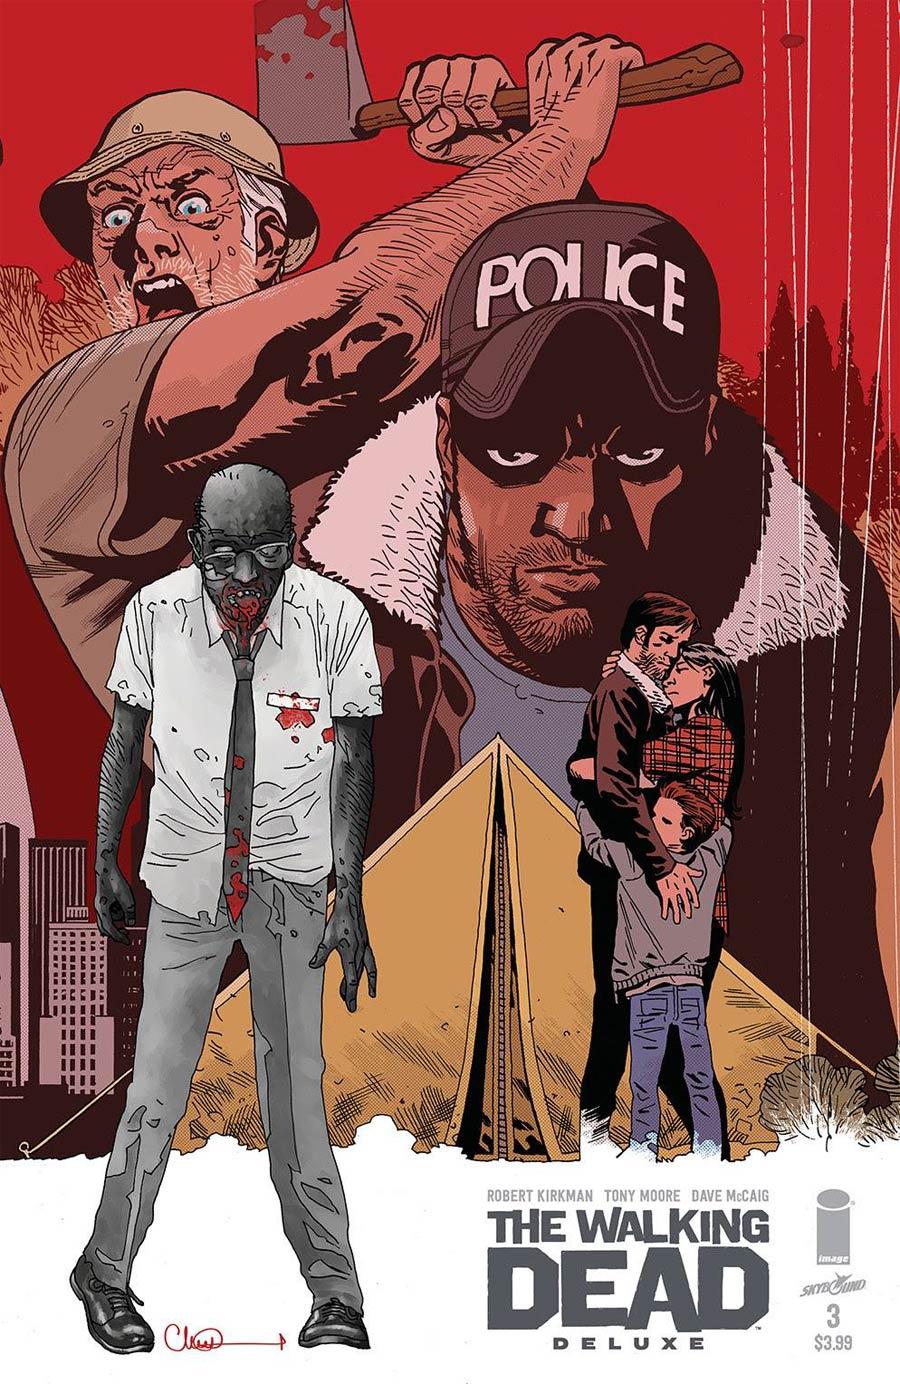 Walking Dead Deluxe #3 Cover C Variant Charlie Adlard & Dave McCaig Cover